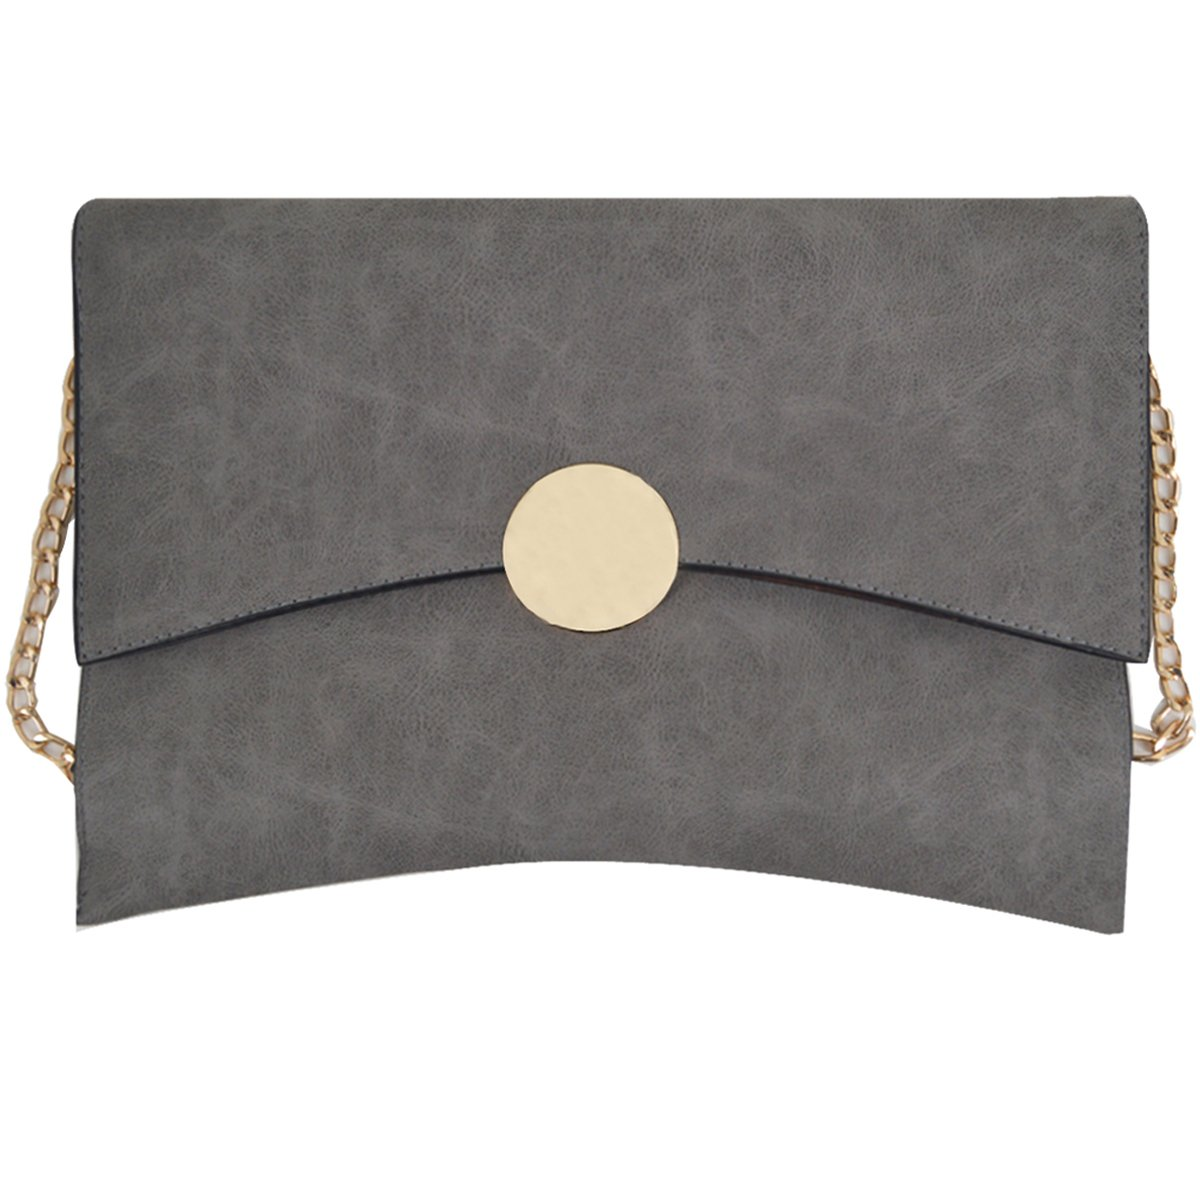 ab6e0dab6355 Get Quotations · Felice Fashionable Oversized Clutch Bag Purse Women Large Envelope  Clutch Chain Shoulder Bag (grey)